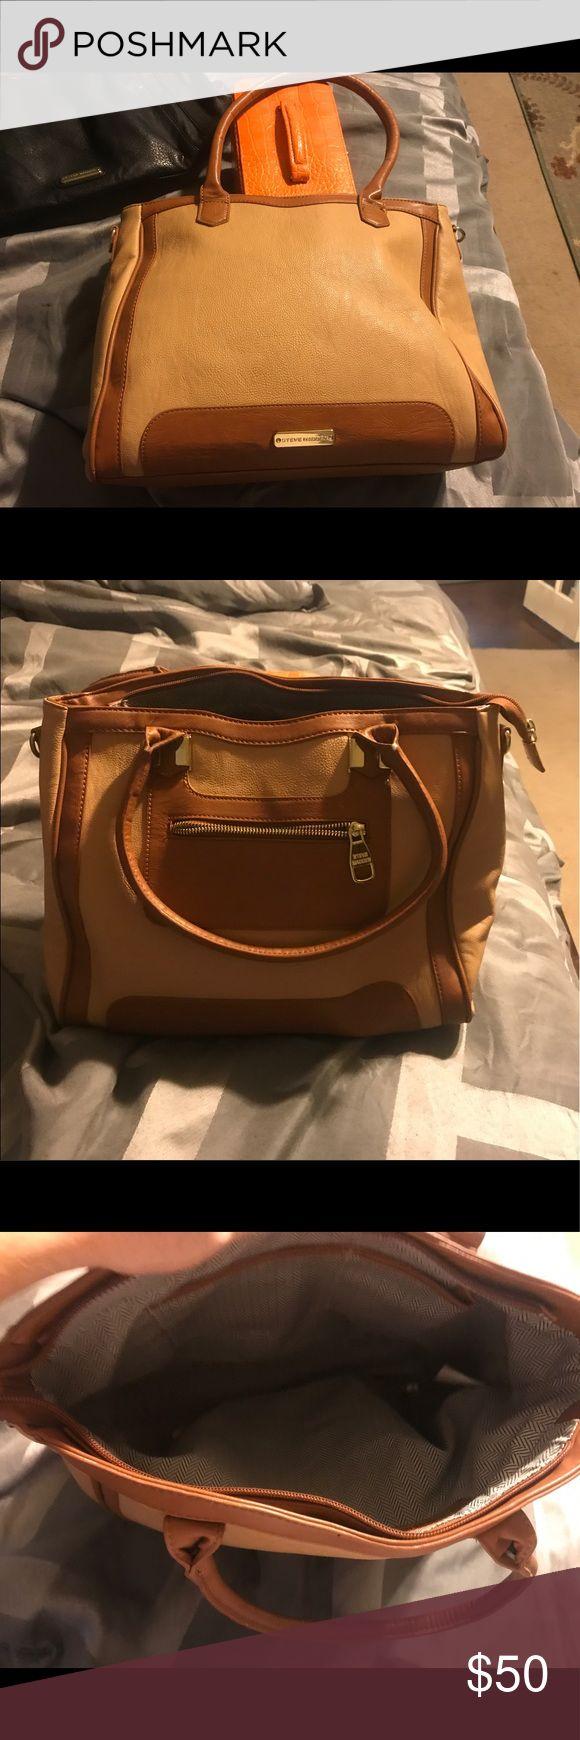 Steve madden purse Very gently used Steve madden purse Steve Madden Bags Shoulder Bags